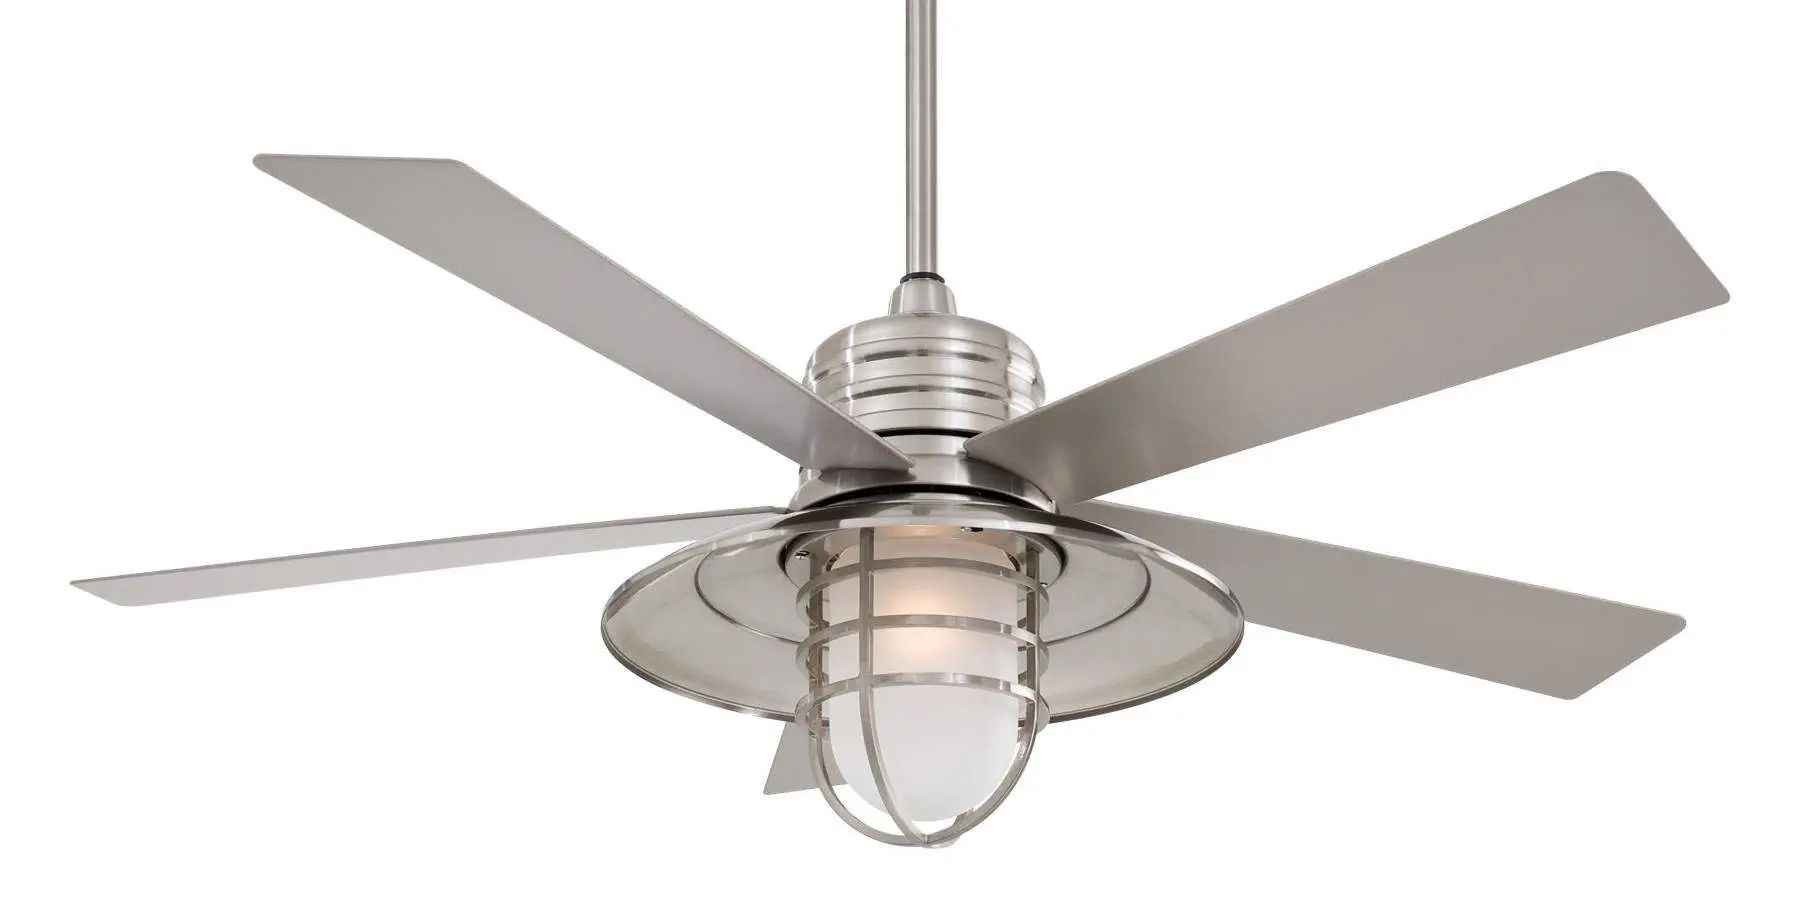 Minka Aire Rainman Ceiling Fan - Brushed Nickel Wet